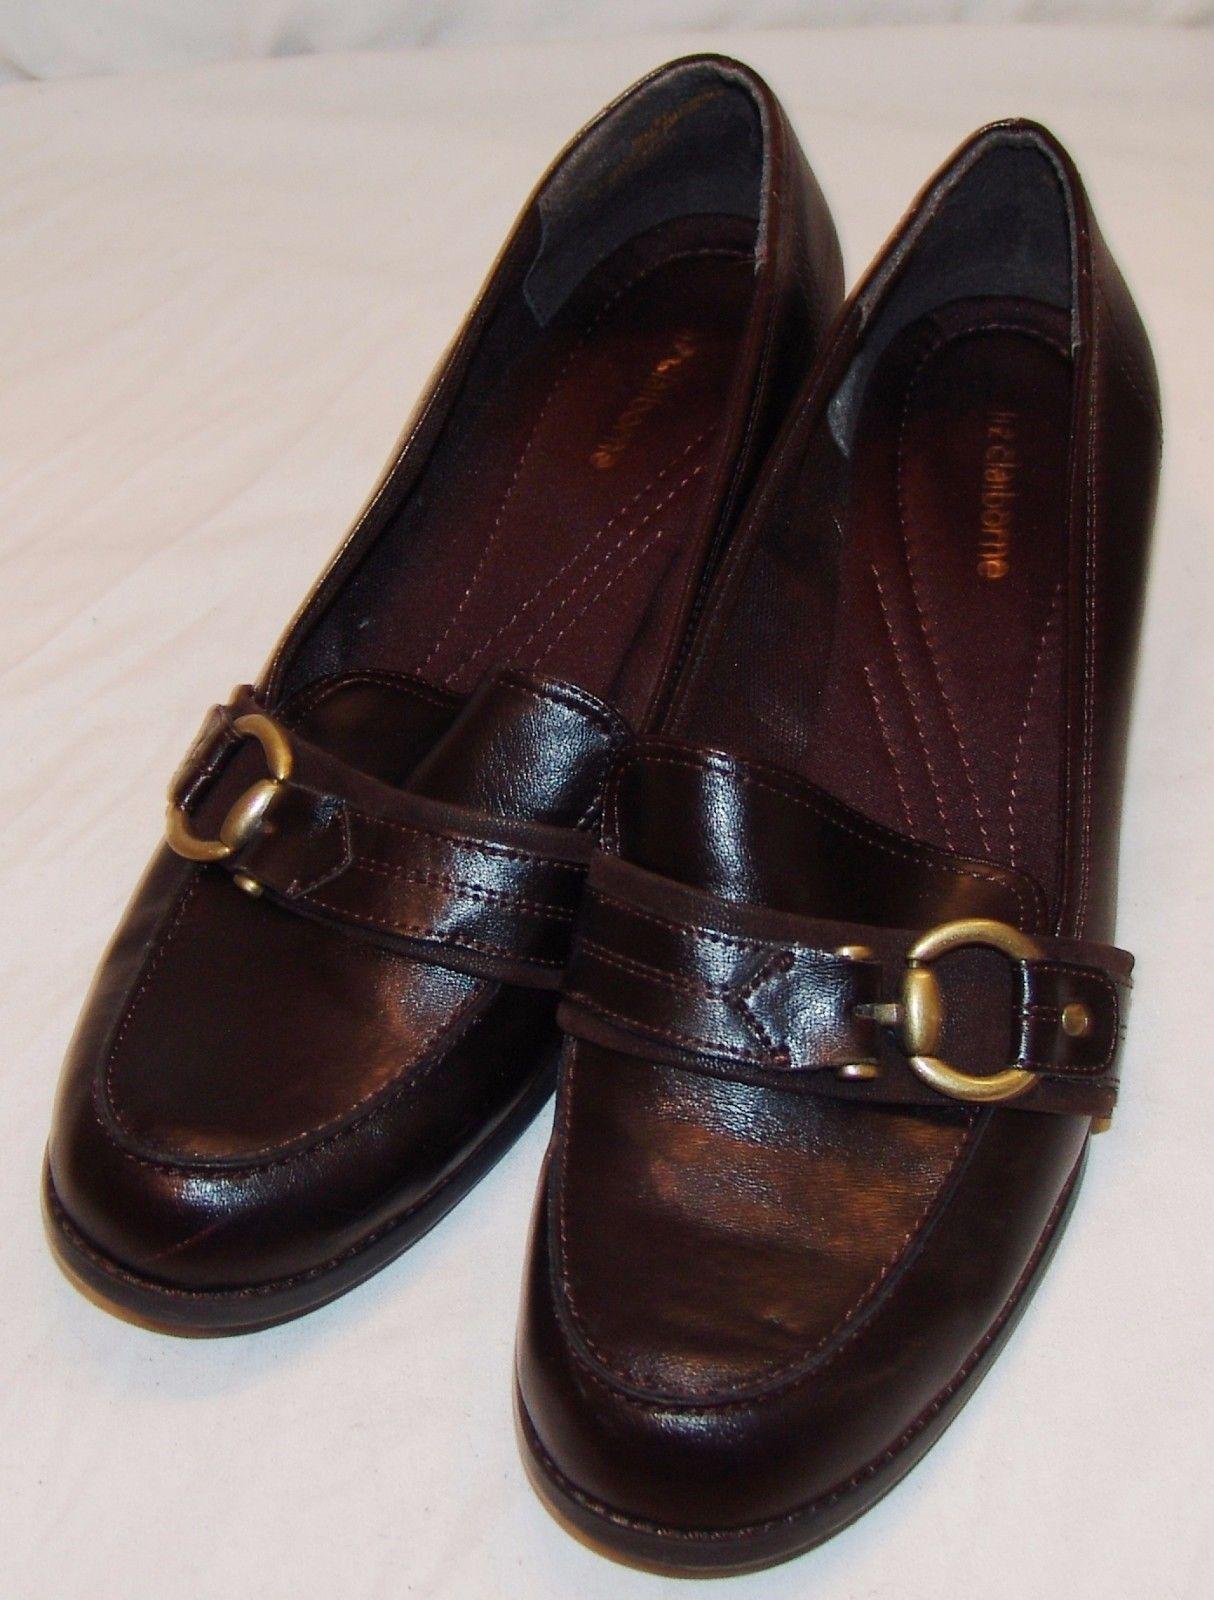 b407eea15e7a10 Liz Claiborne Heels Womens 11M 11 M Kelley Shoes Brown Buckle Slip On